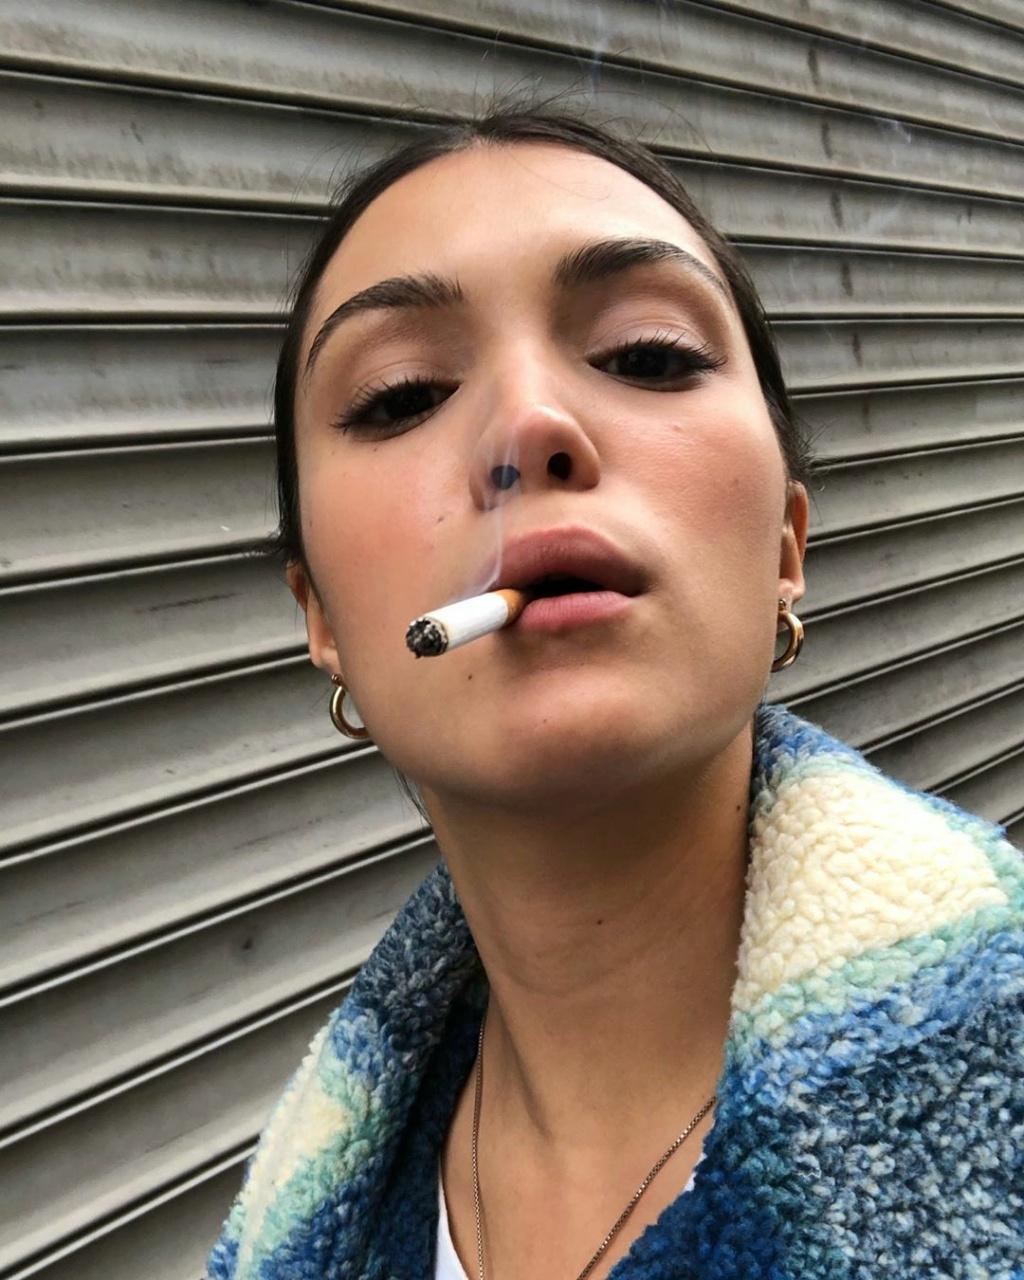 La cigarette dans PBLV - Page 3 Smartk10